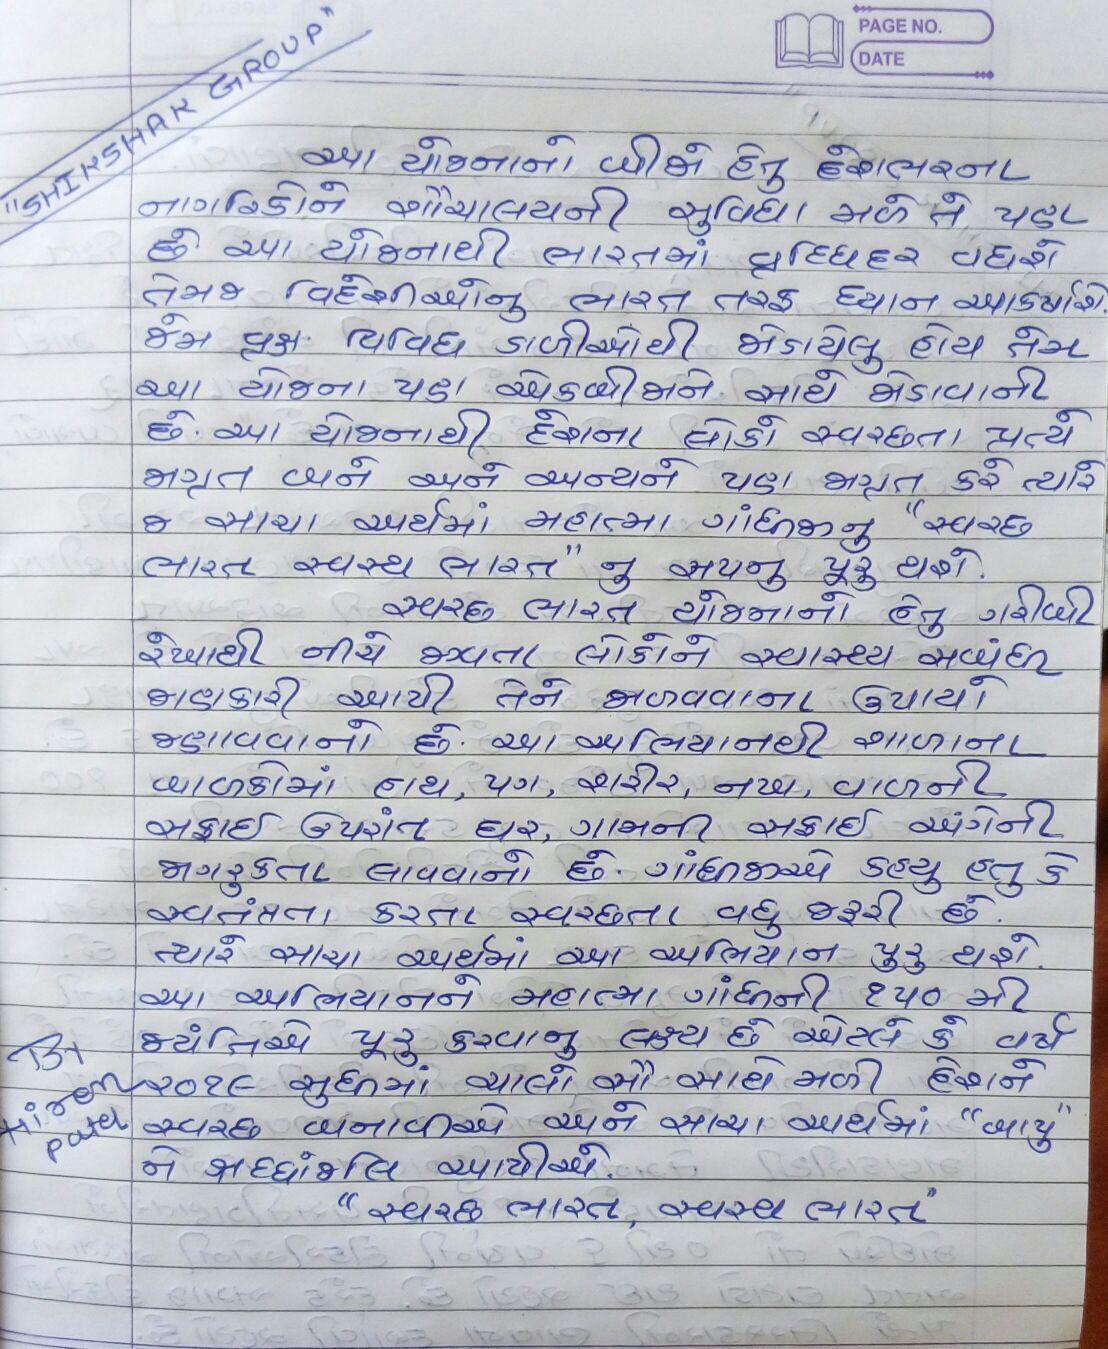 swachh bharat sundar bharat essay in gujarati